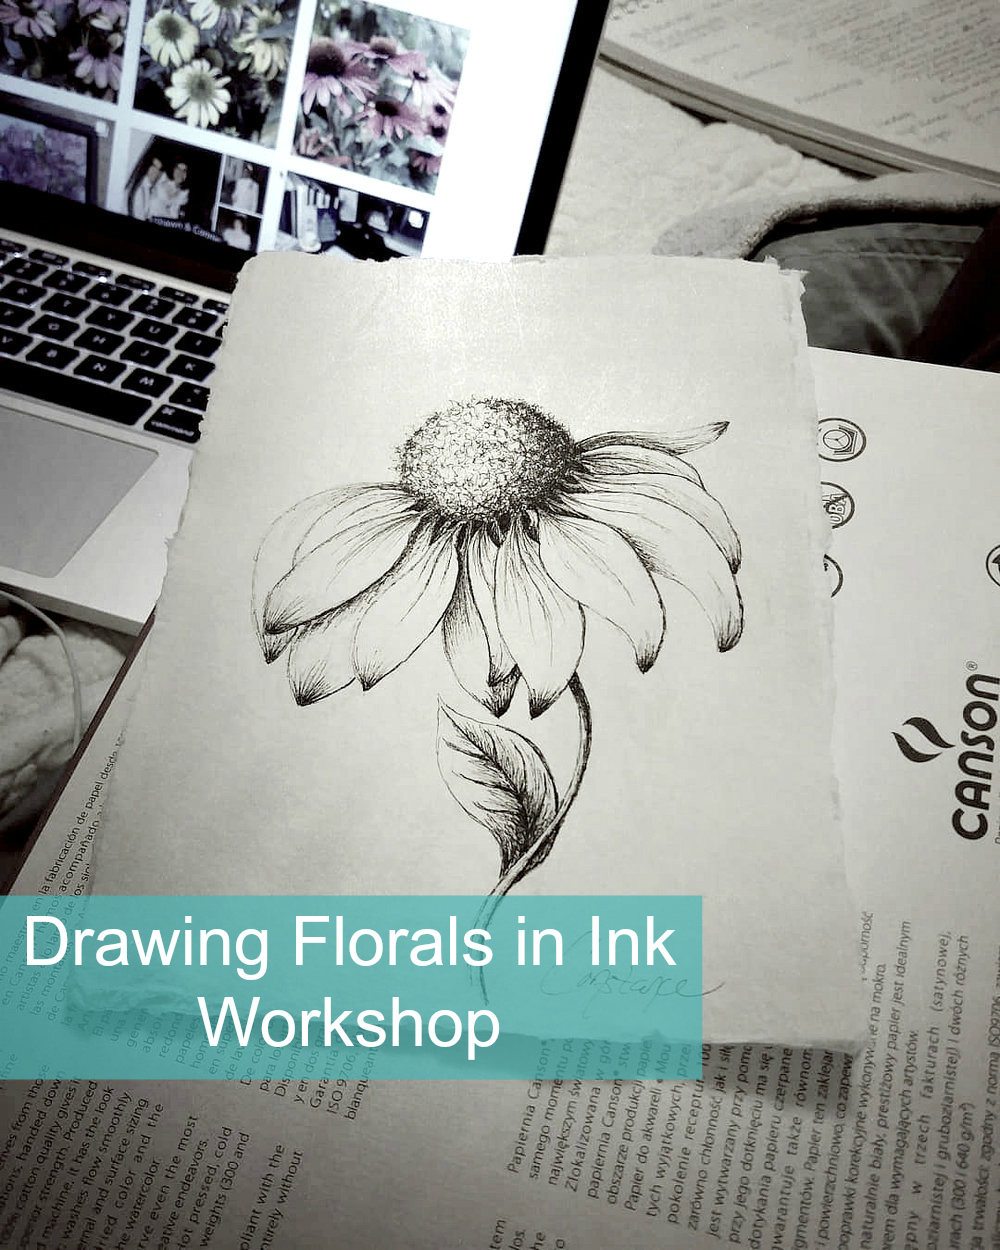 DrawingFloralsInInkWorkshopCover.jpg